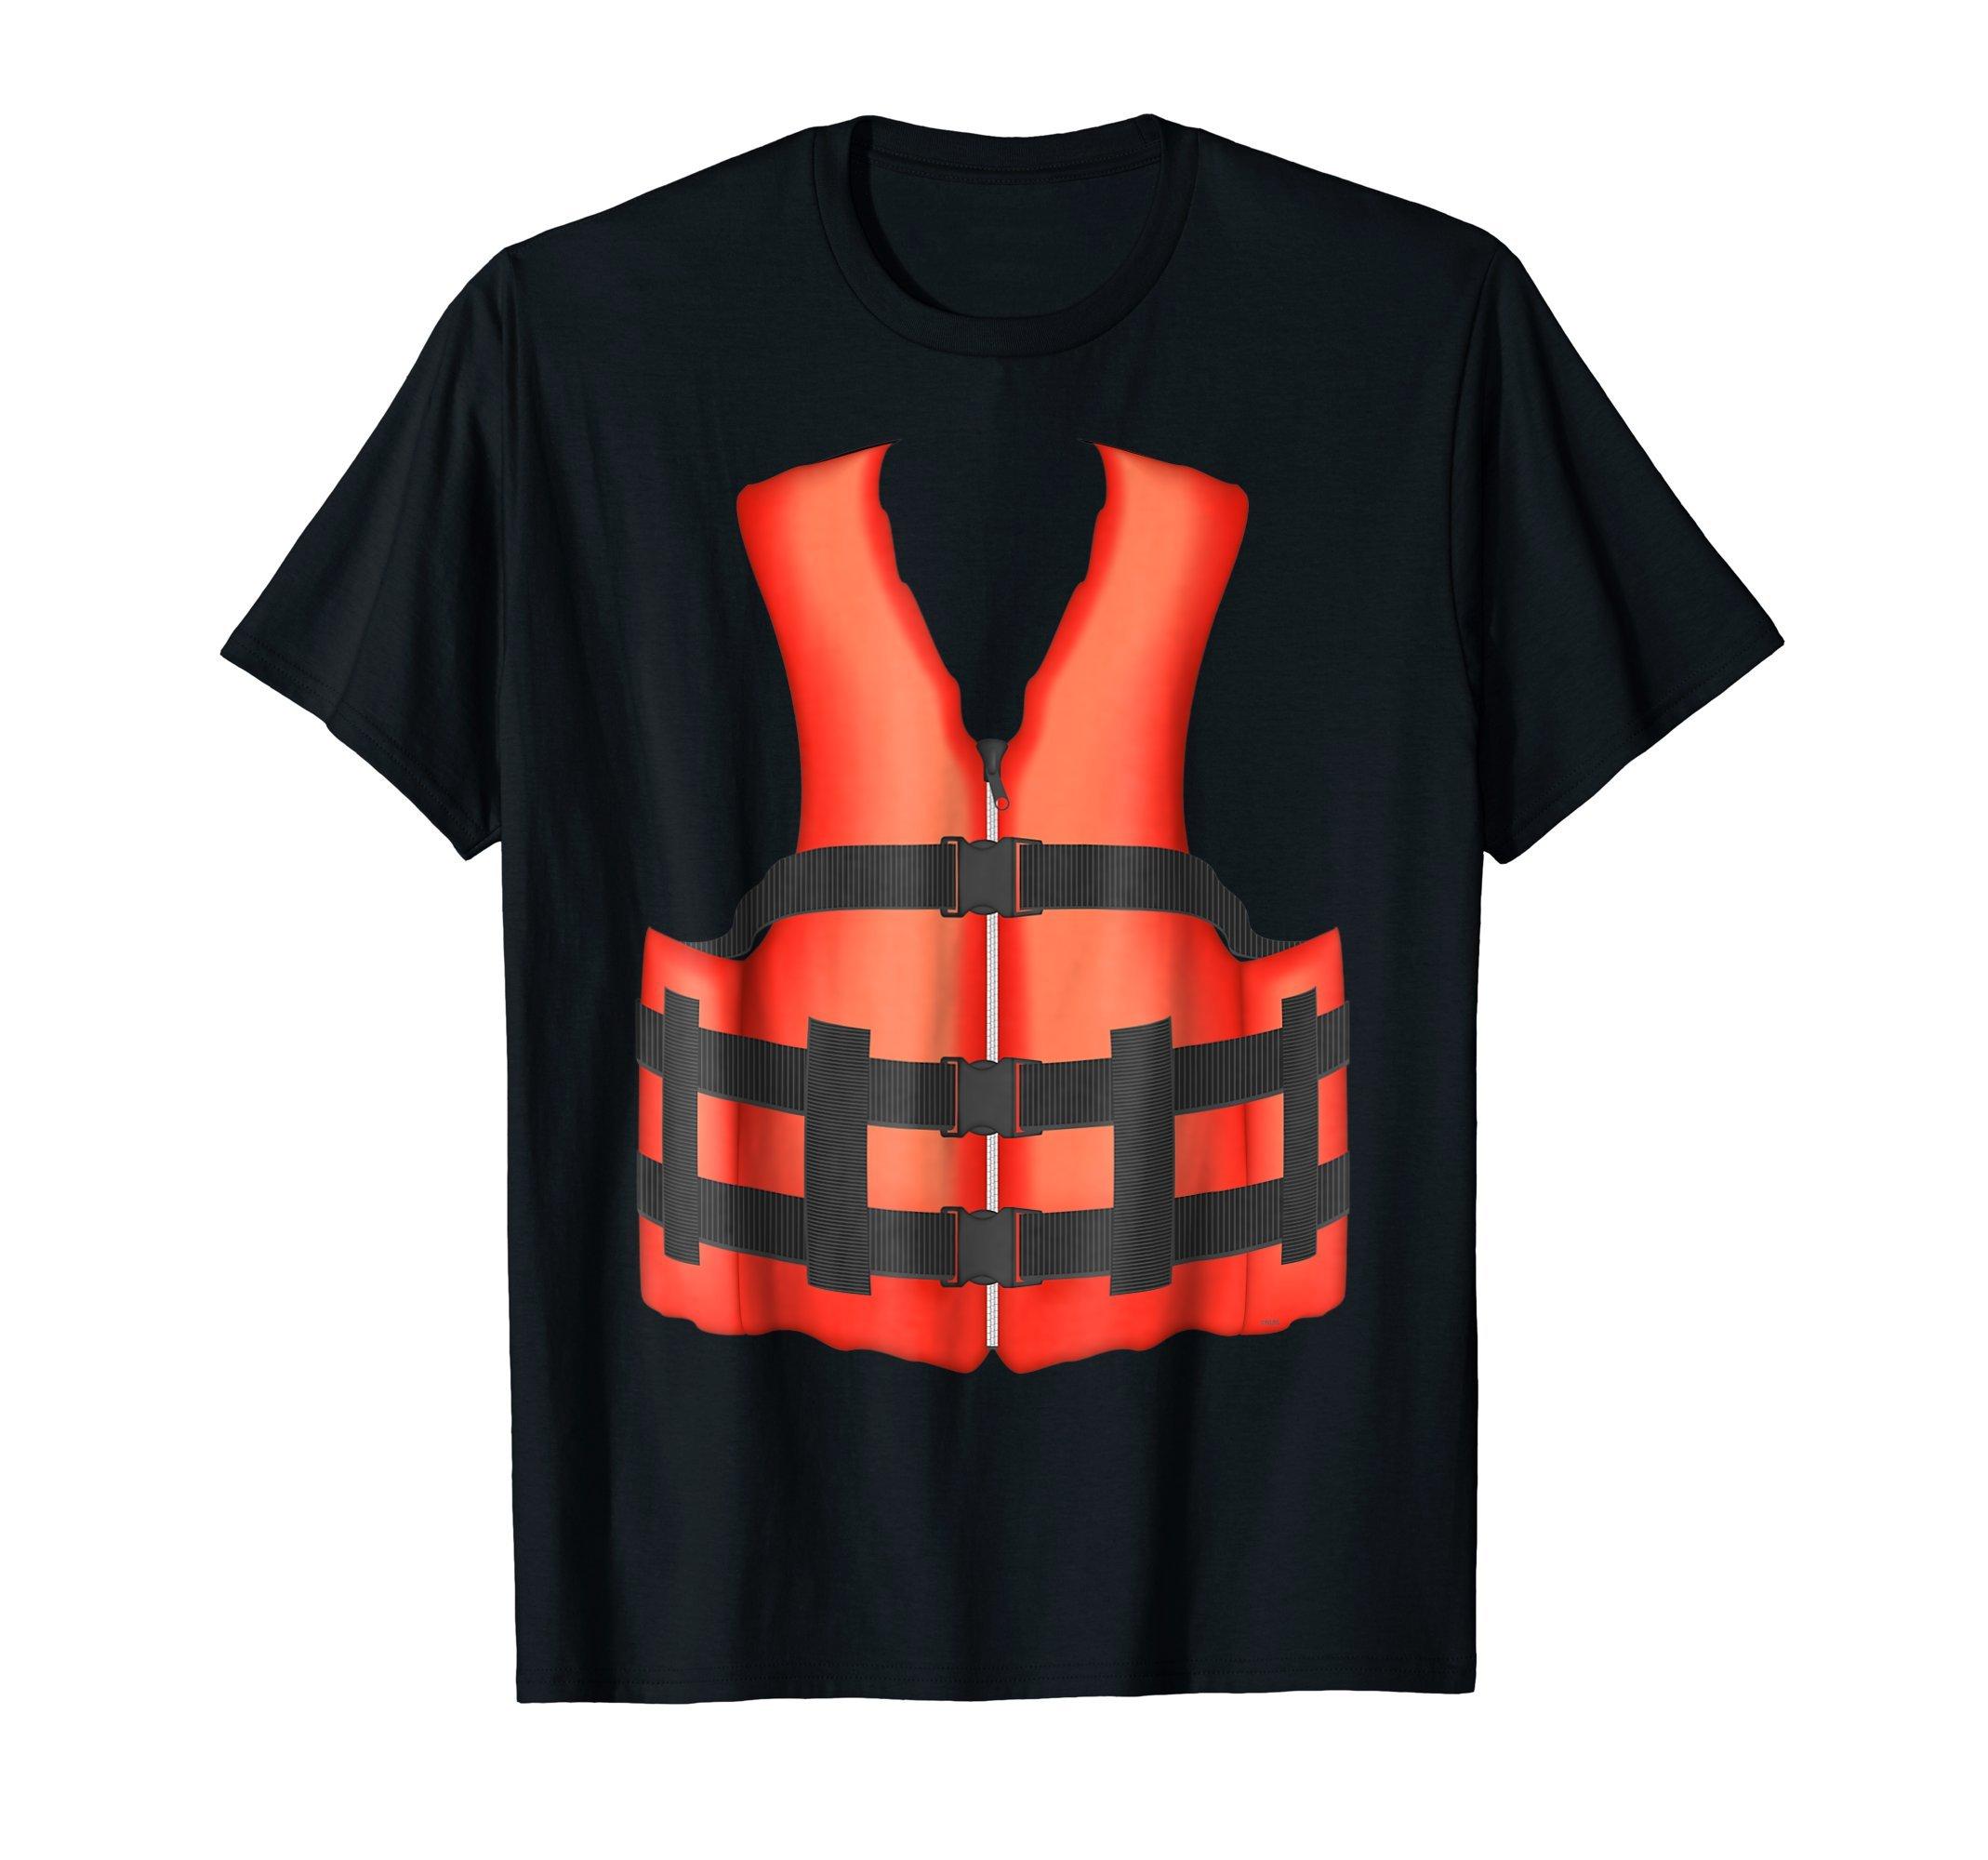 Realistic-orange-life-vest-jacket-Summer-T-Shirt-Gift-Shirt